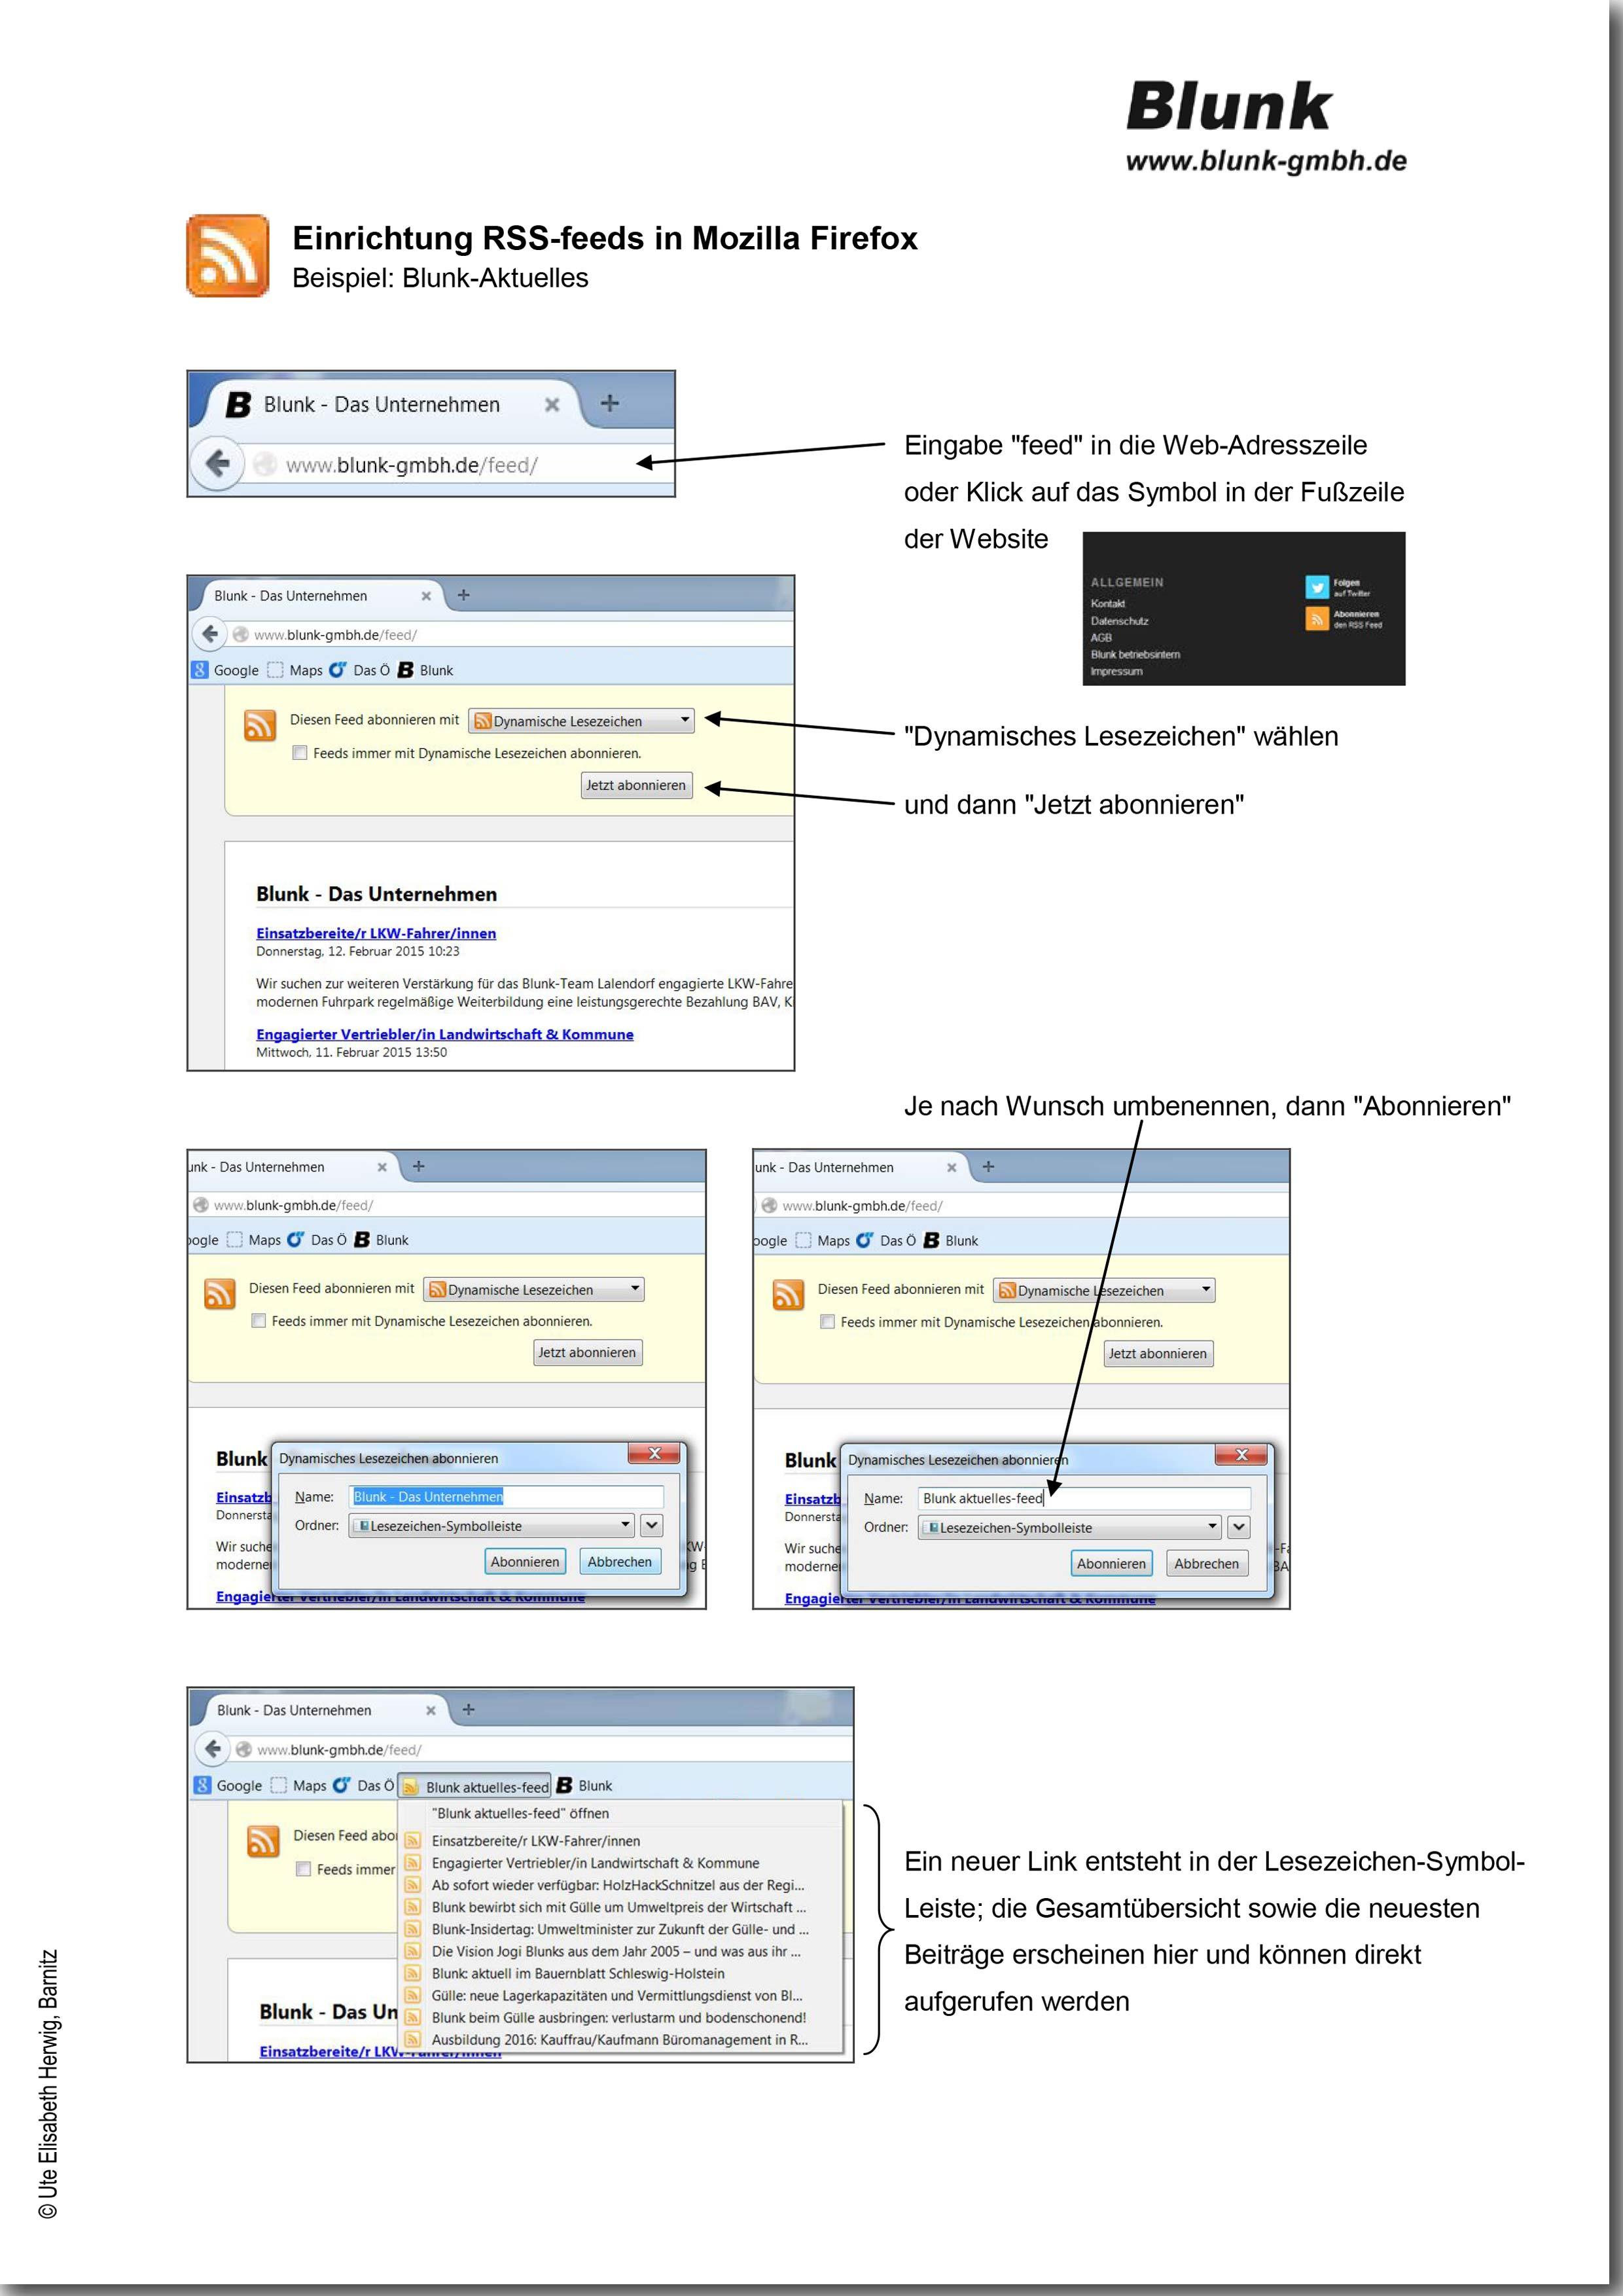 Blunk RSS feeds Mozilla Firefox -titel